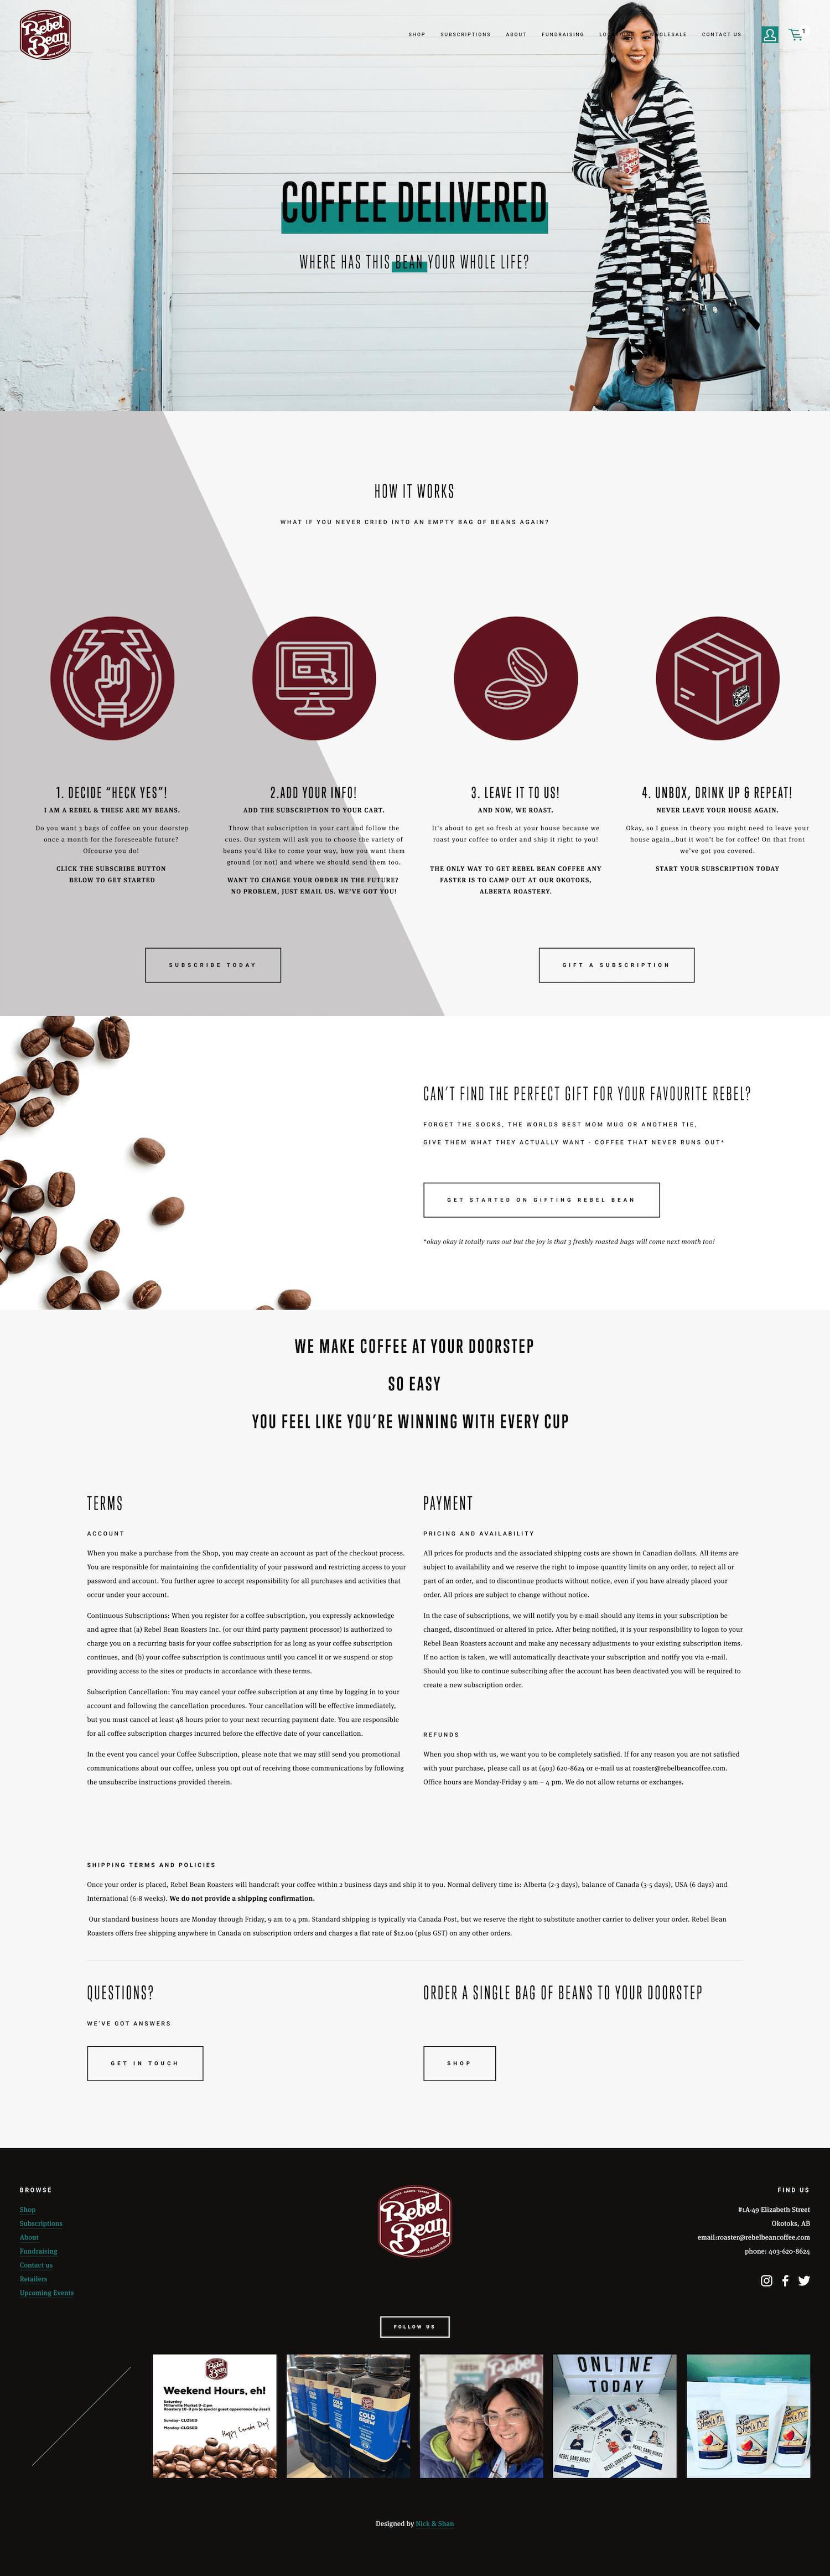 screencapture-rebelbeancoffee-rebel-bean-subscriptions-2019-07-03-15_54_58.png